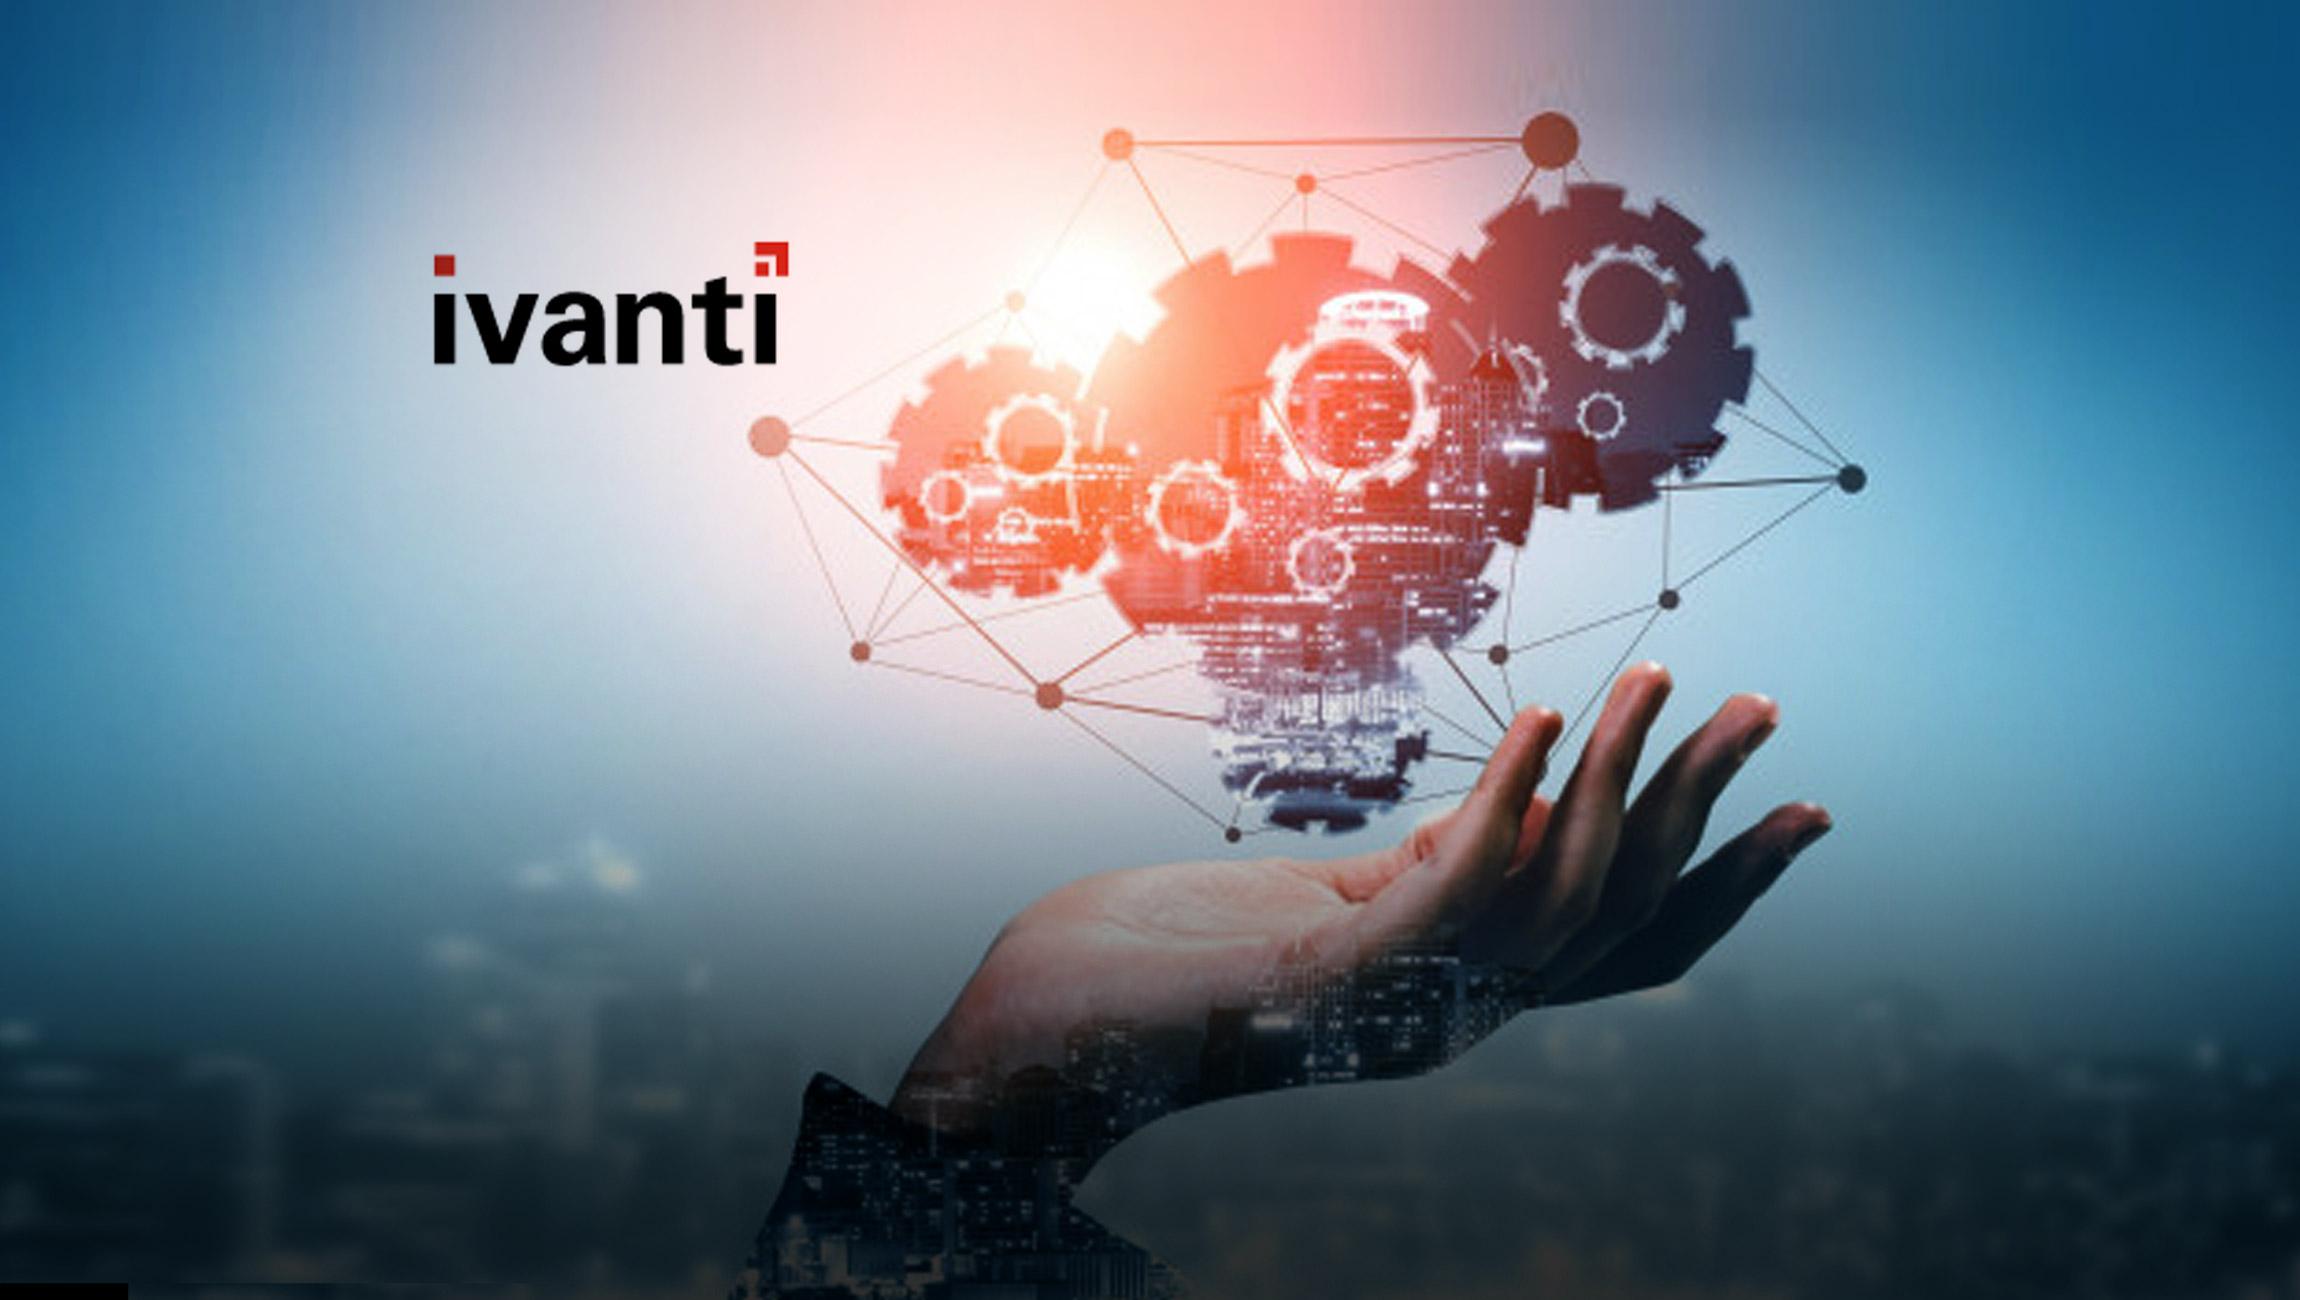 Ivanti Integrates Ivanti Neurons Platform with Splunk Security Operations Suite to Further Enable the Self-Healing Autonomous Edge